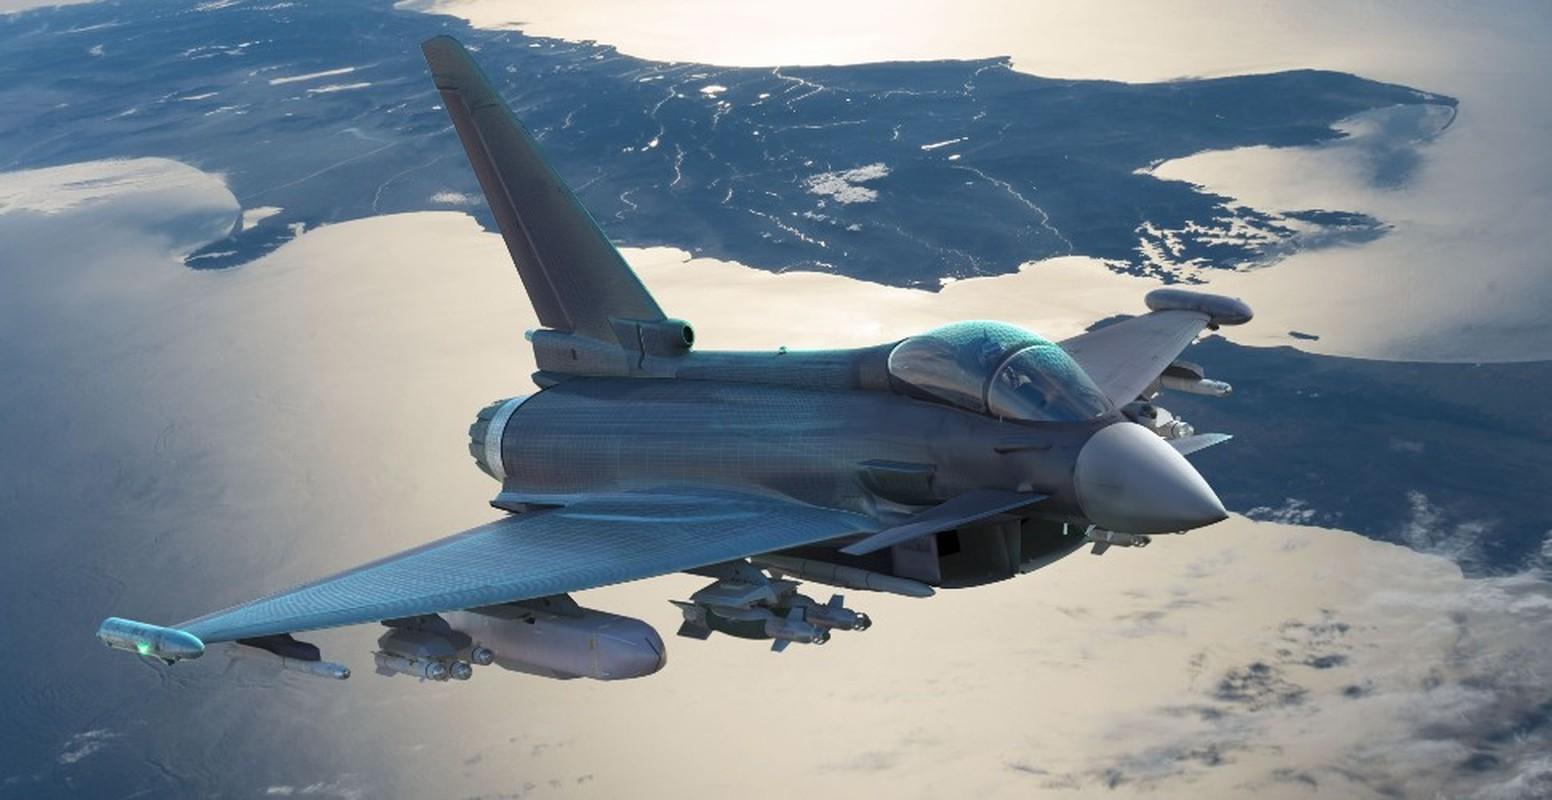 Quan tam Eurofighter Typhoon cua Ao, Indonesia huy hop dong mua Su-35 Nga?-Hinh-9